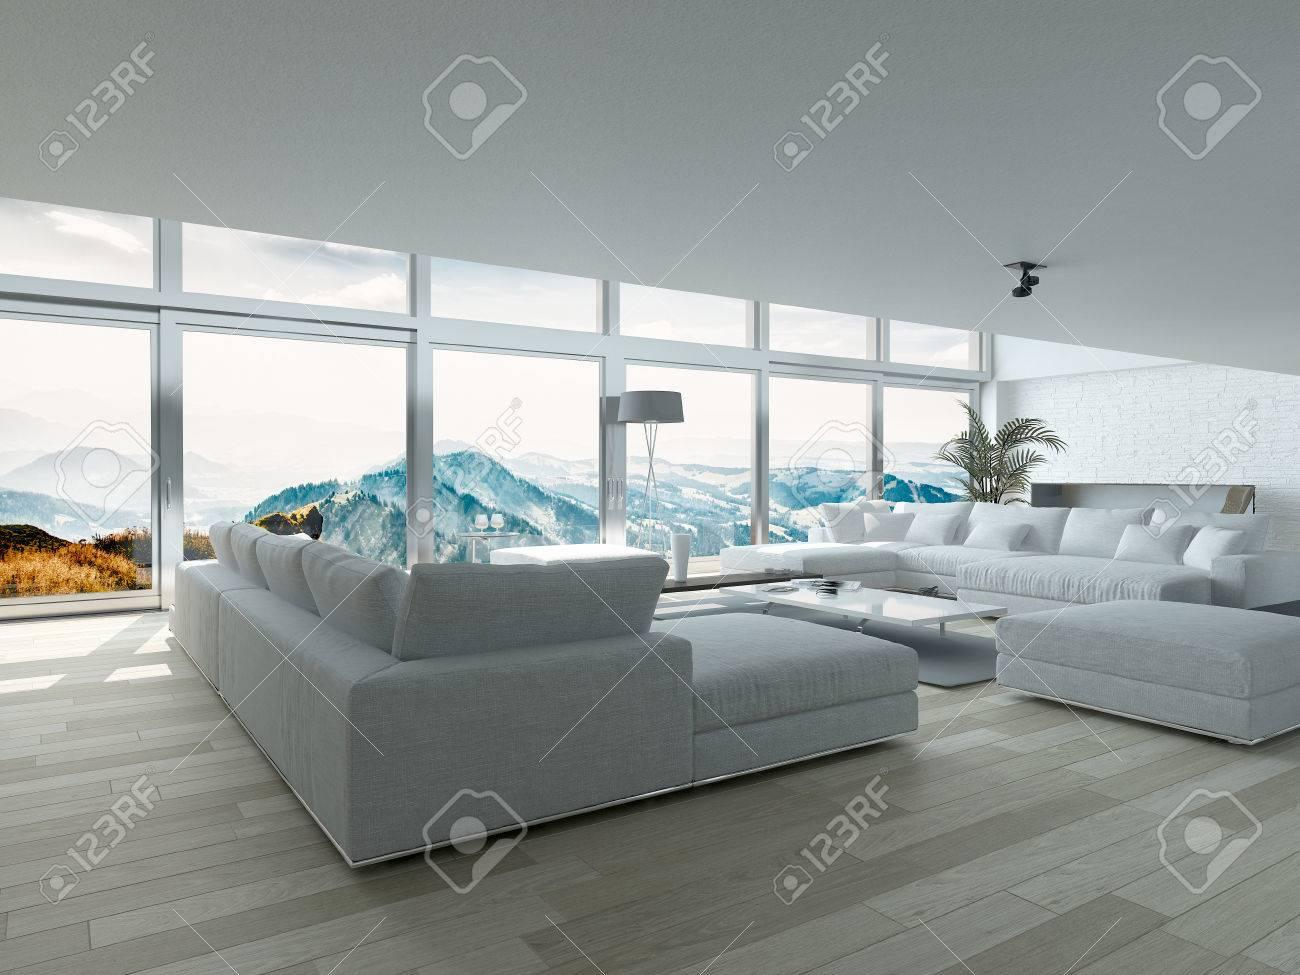 . Modern Residence Living Room Design with Elegant Furniture and